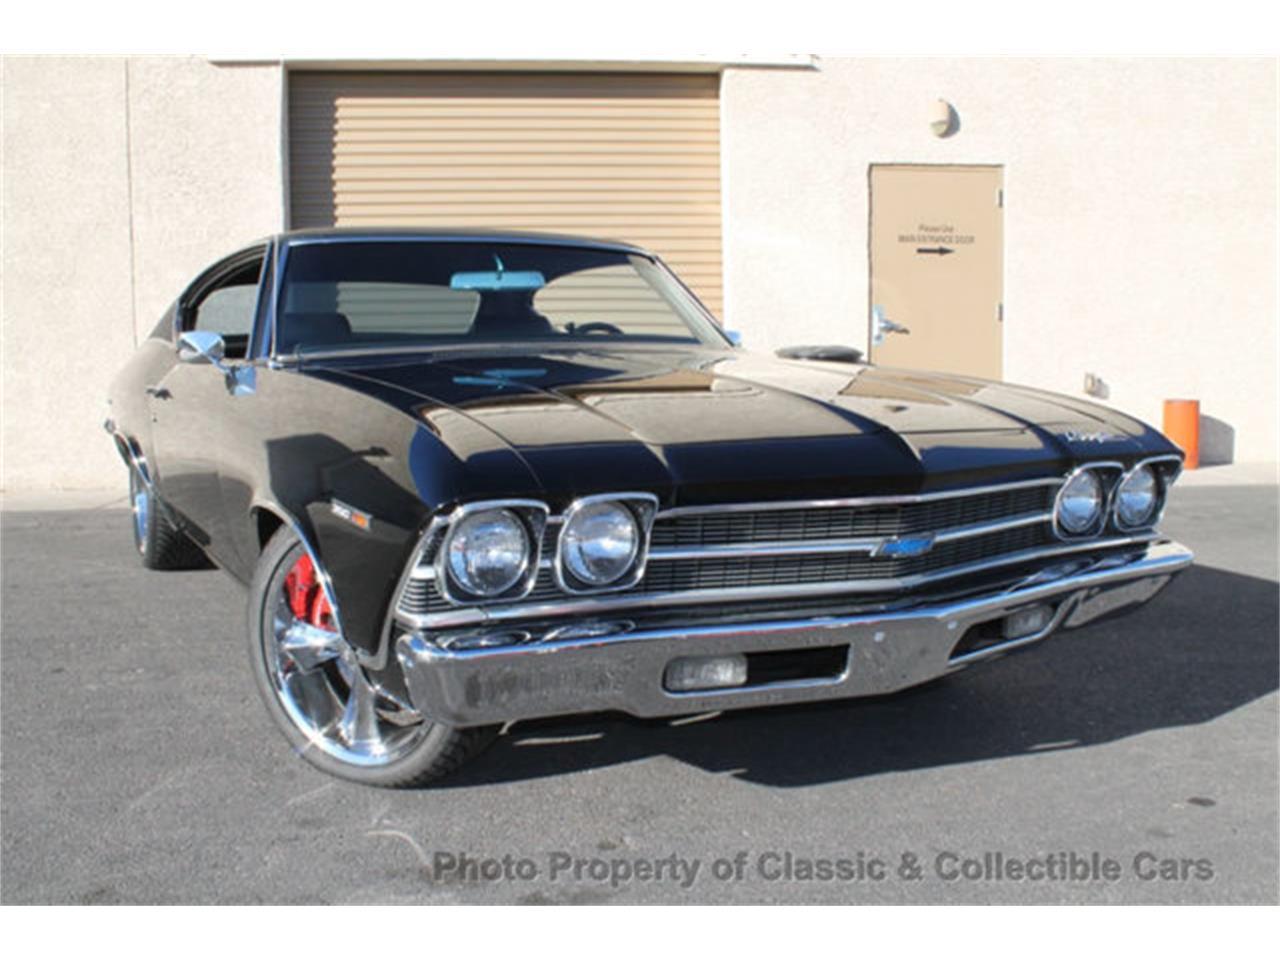 Cars For Sale In Las Vegas >> 1969 Chevrolet Chevelle For Sale Classiccars Com Cc 1173769